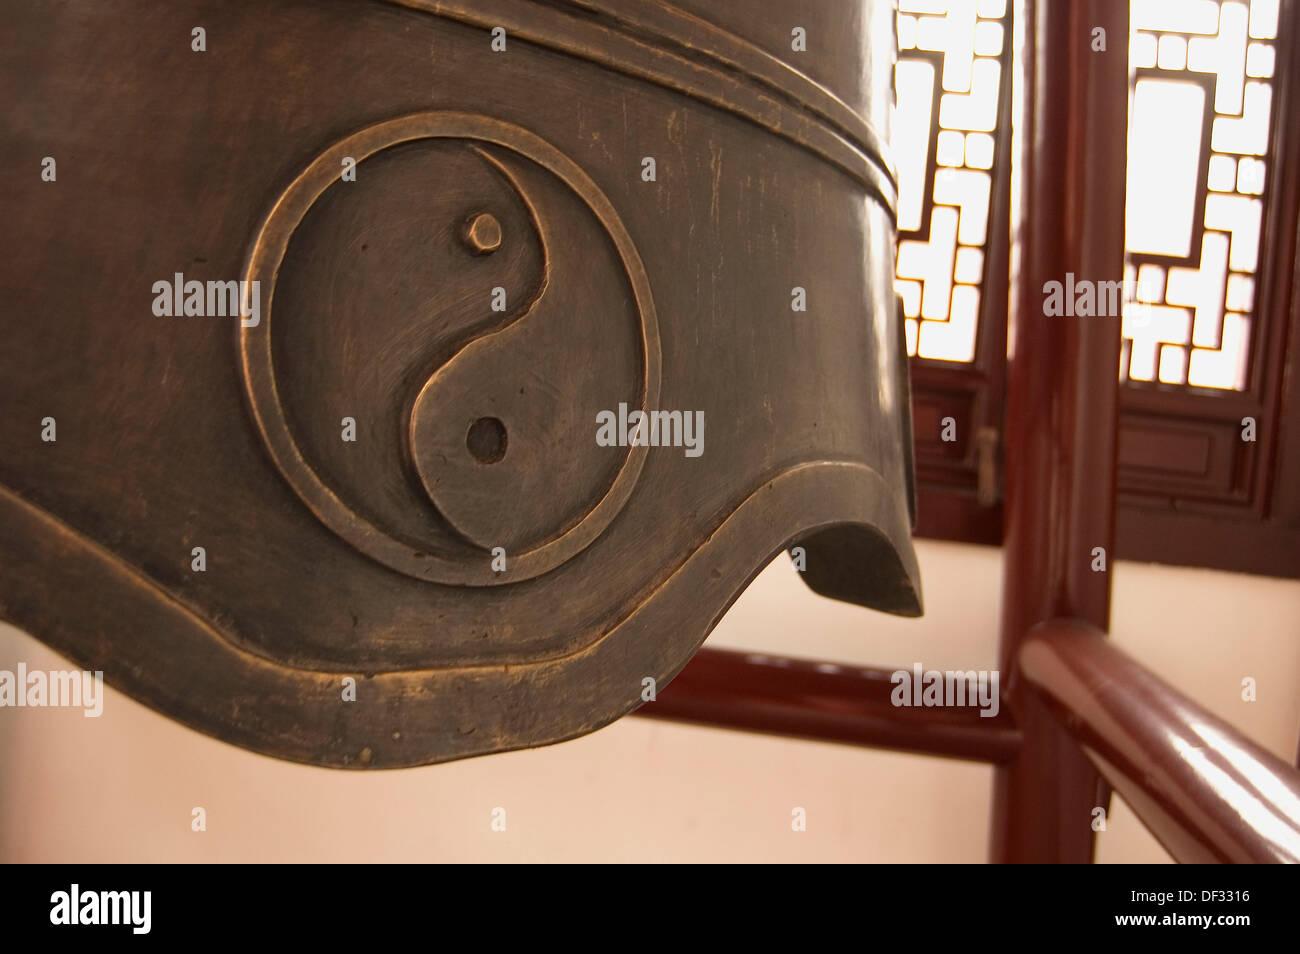 Campana in bronzo con ying yang il simbolo nel Tempio Taoista. Shanghai. Cina Immagini Stock